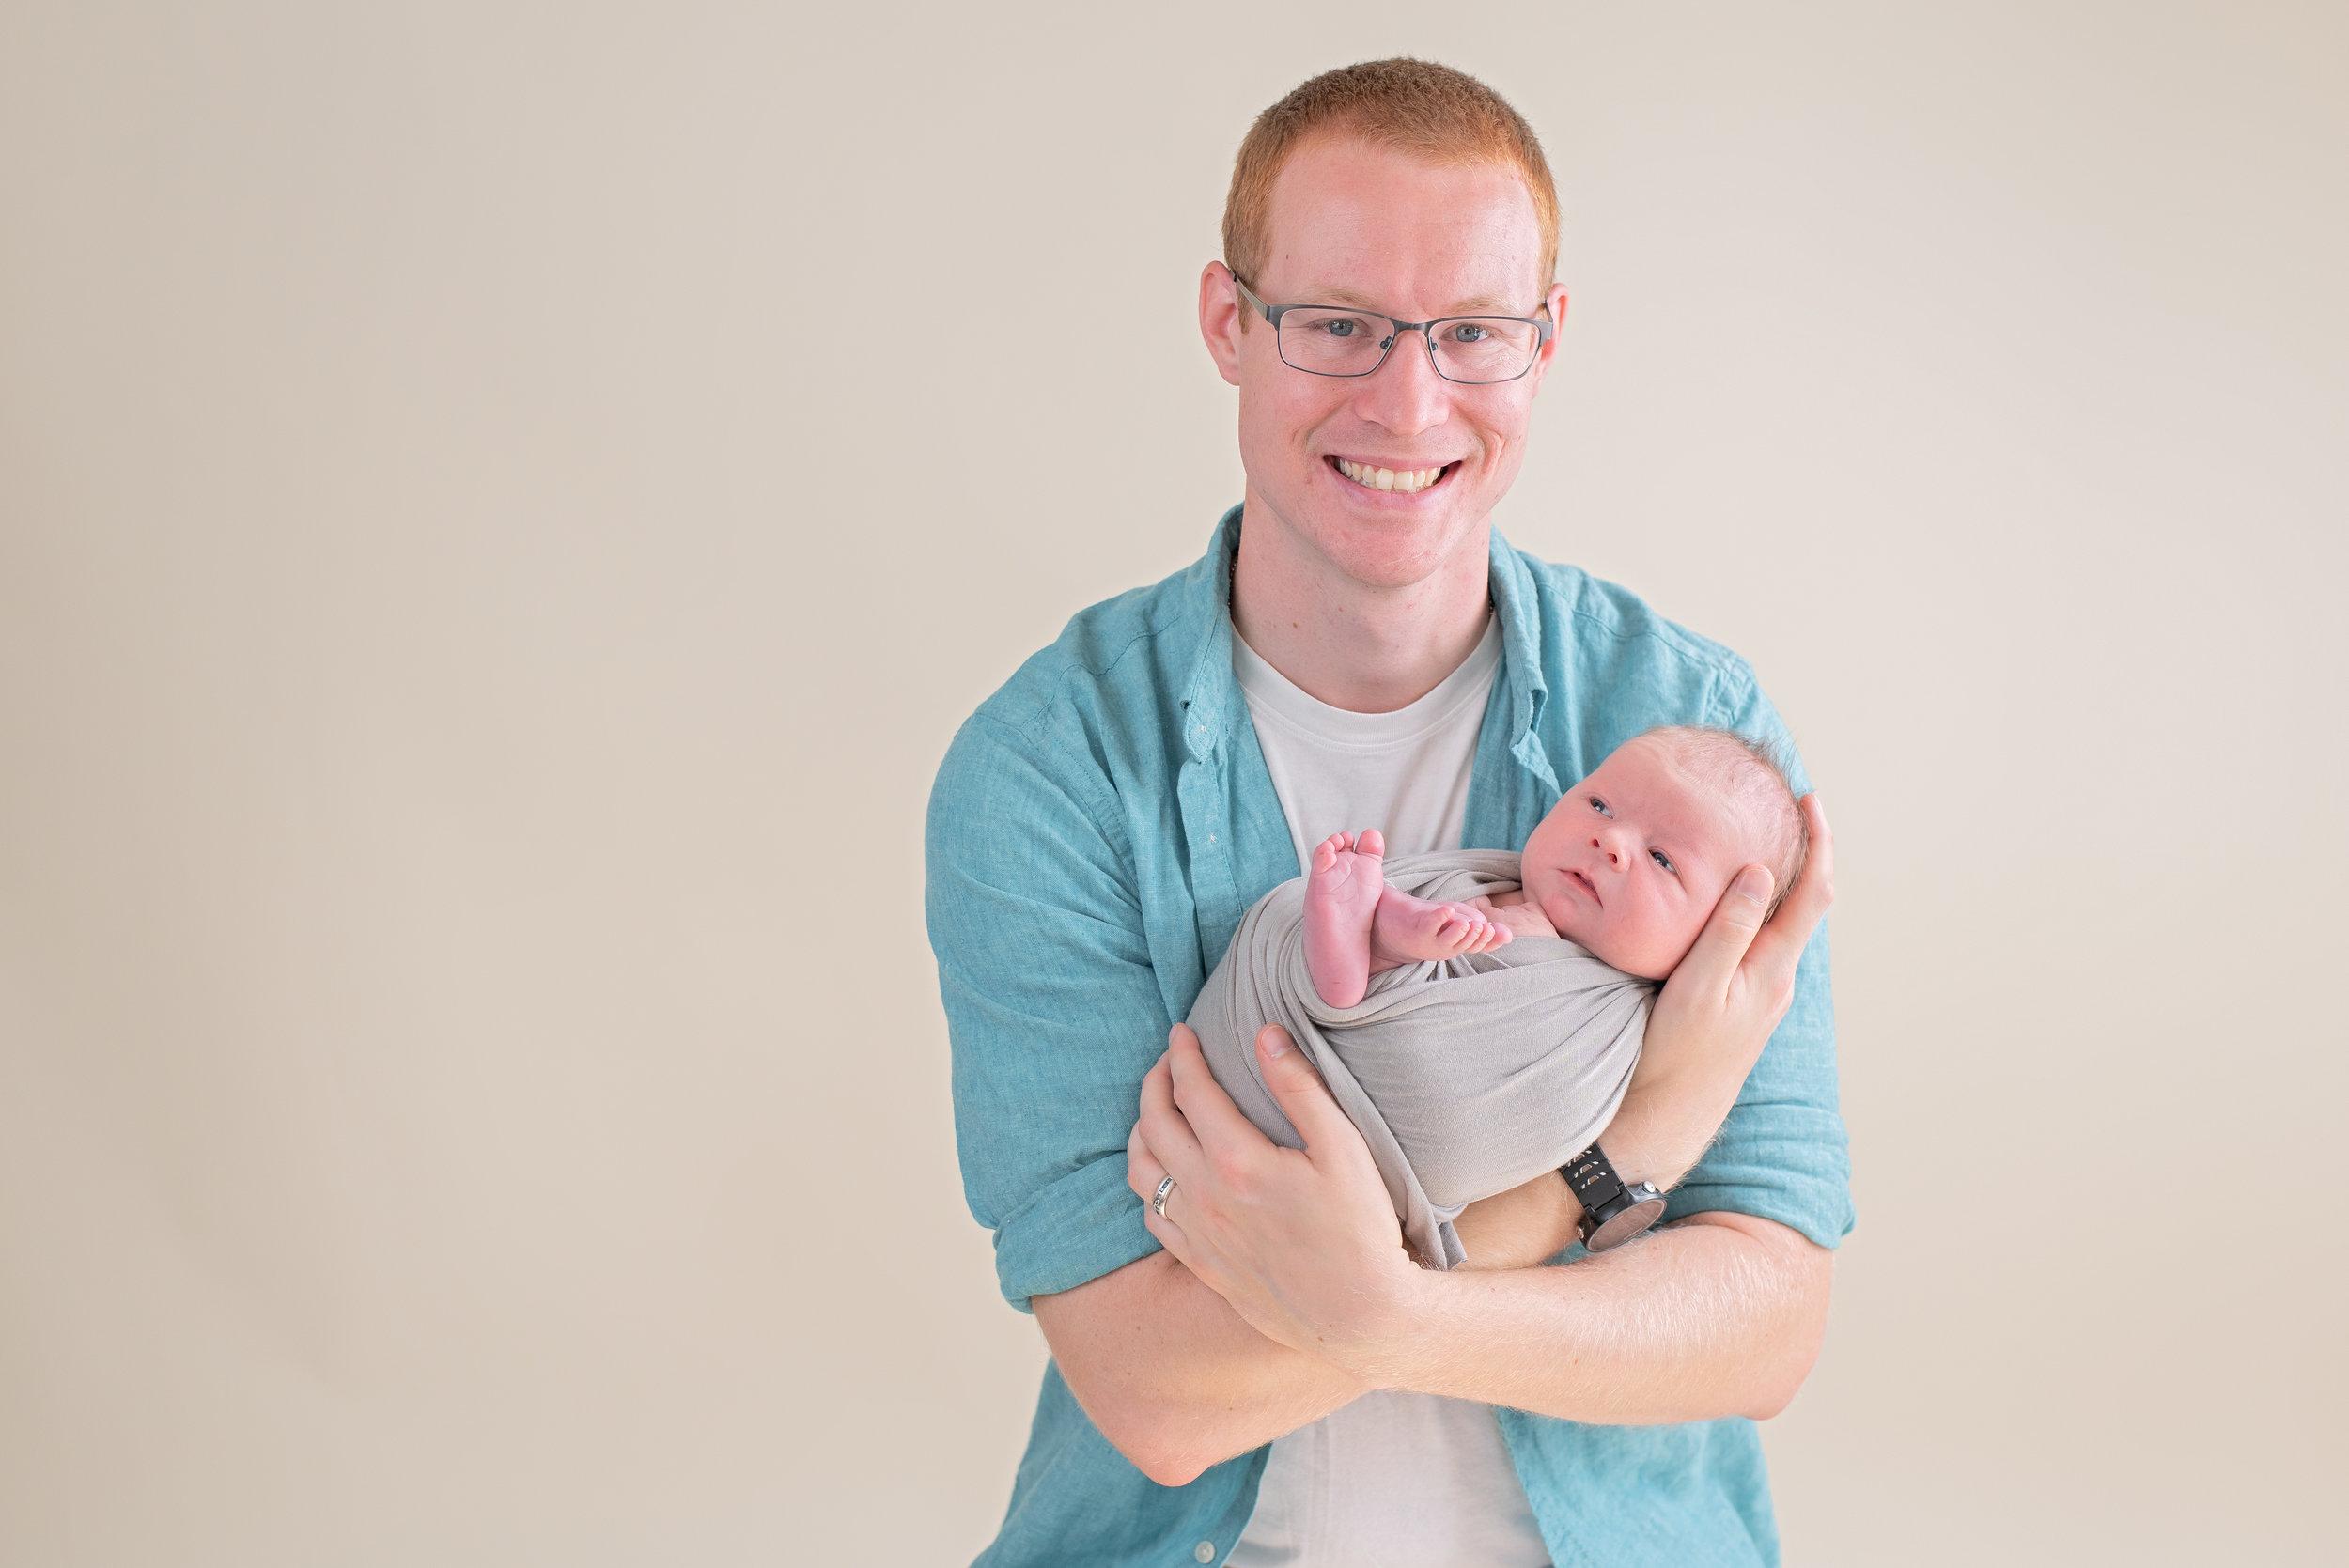 dad holding newborn pose